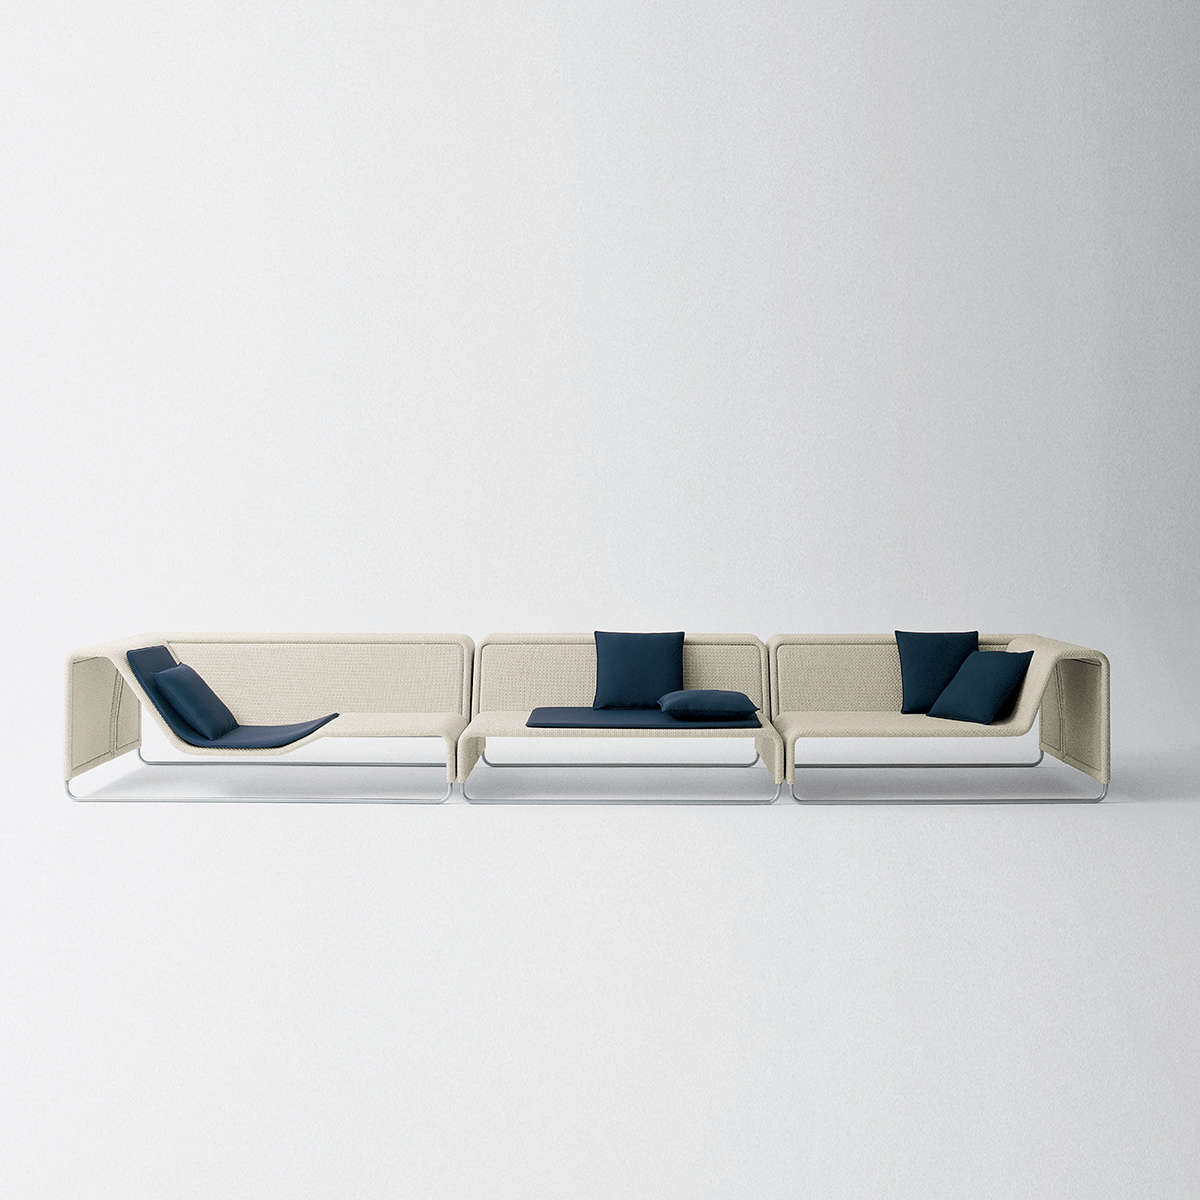 Paola Lenti Island Modular Sofa Hr 2